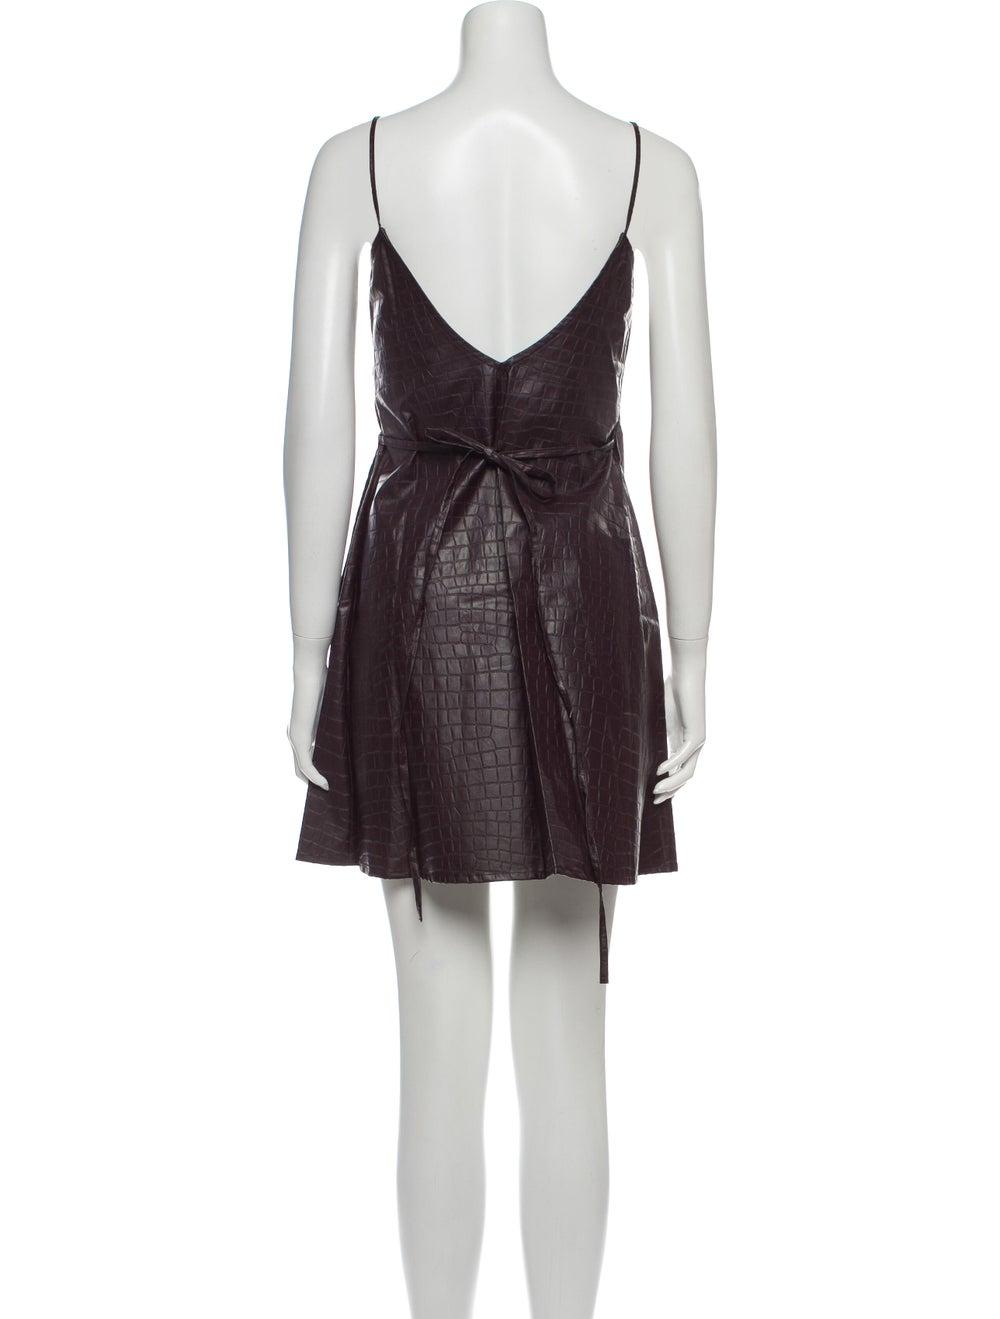 Beaufille Linen Mini Dress w/ Tags - image 3